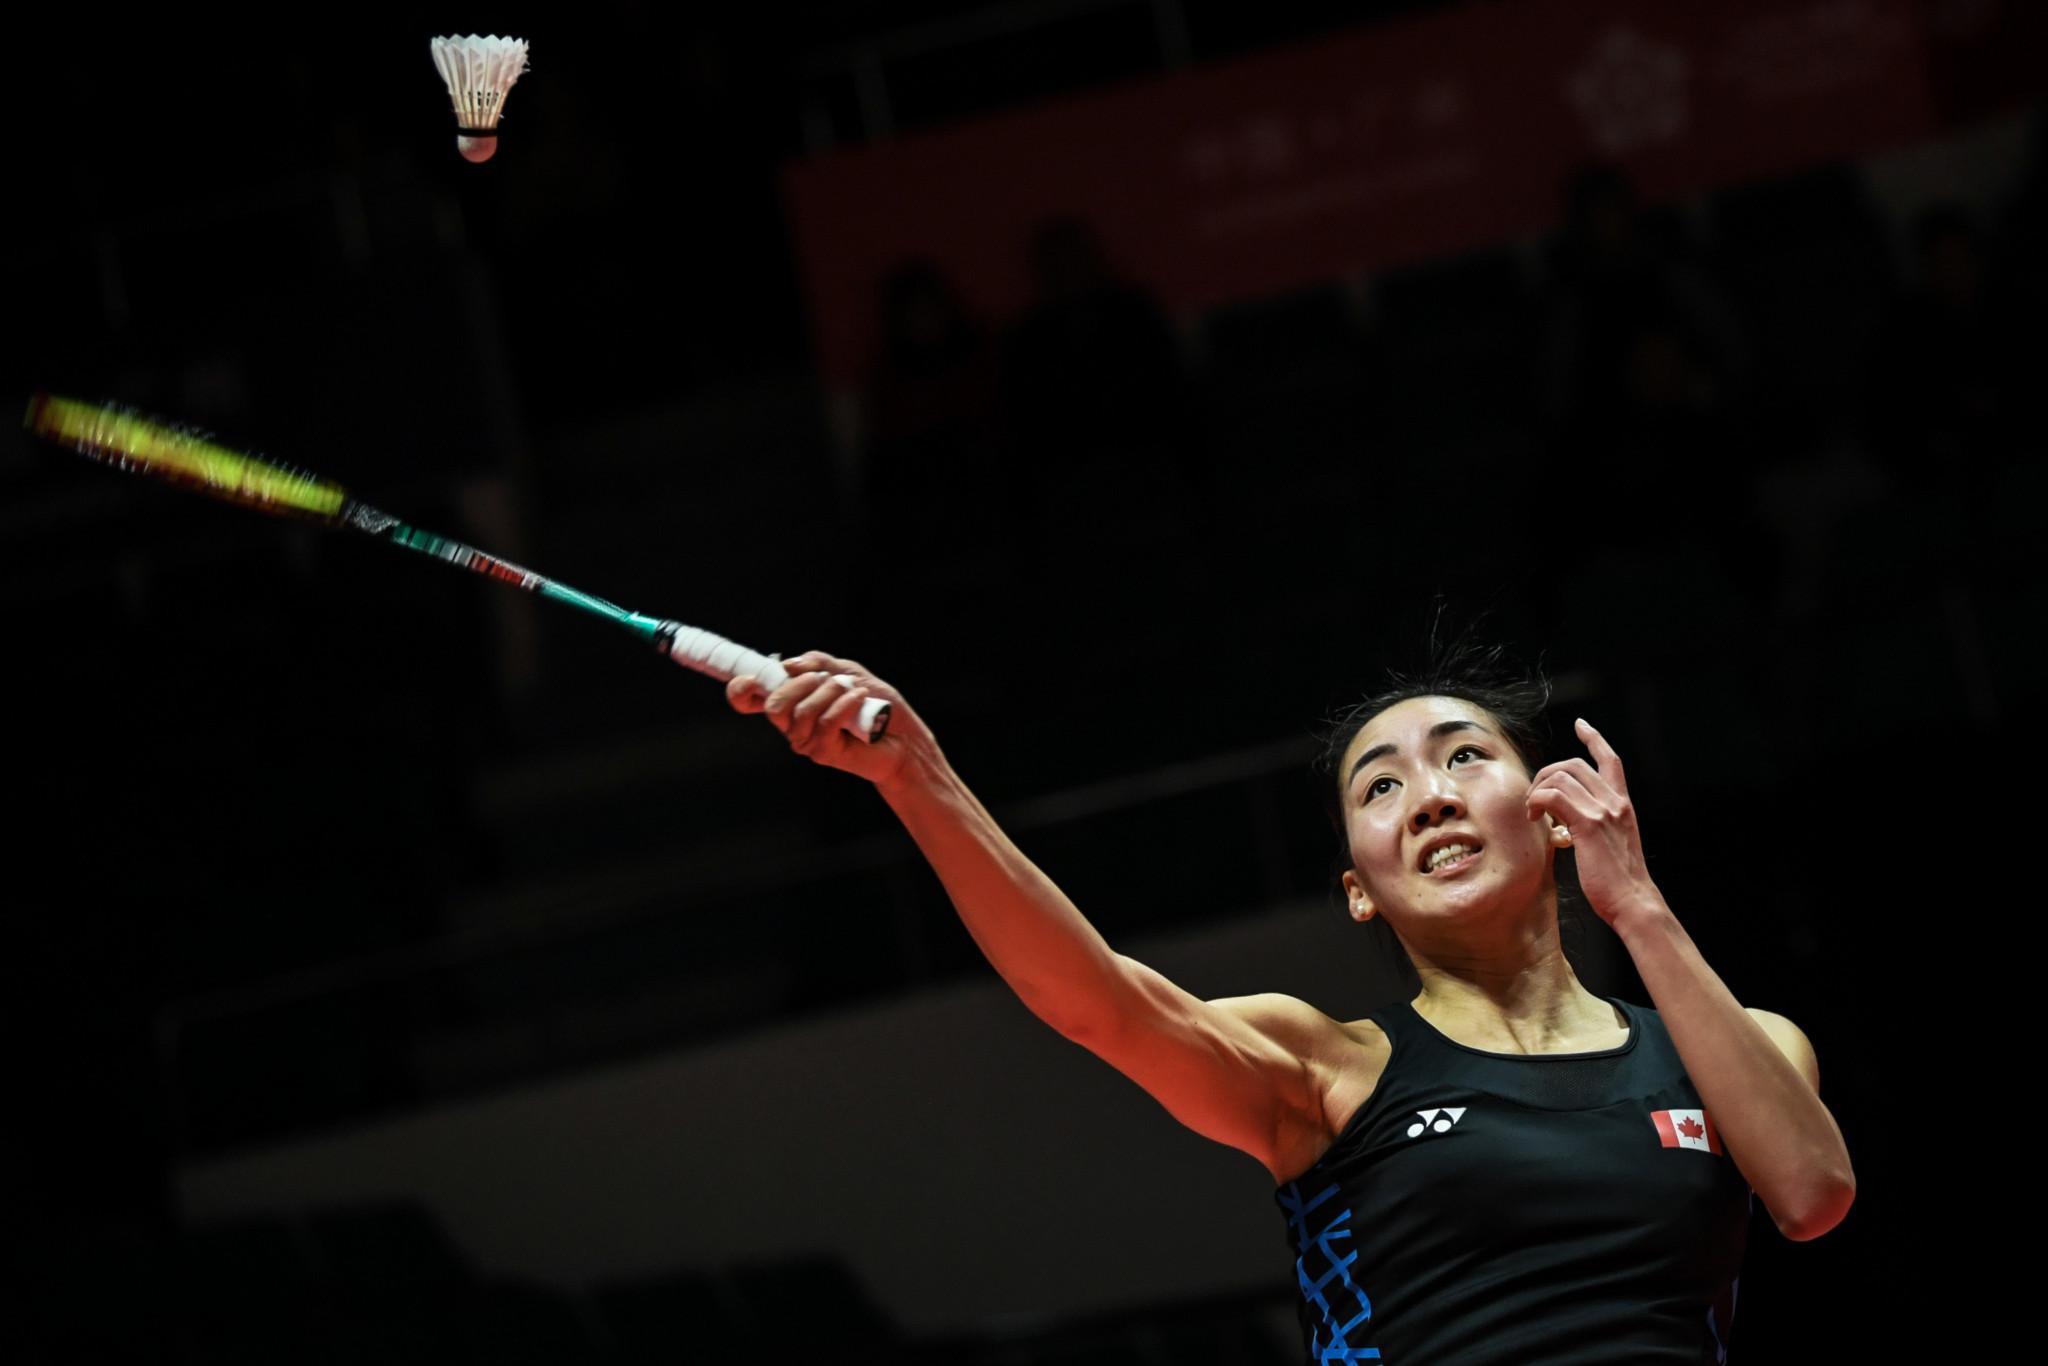 Li defends singles title at Pan American Individual Badminton Championships